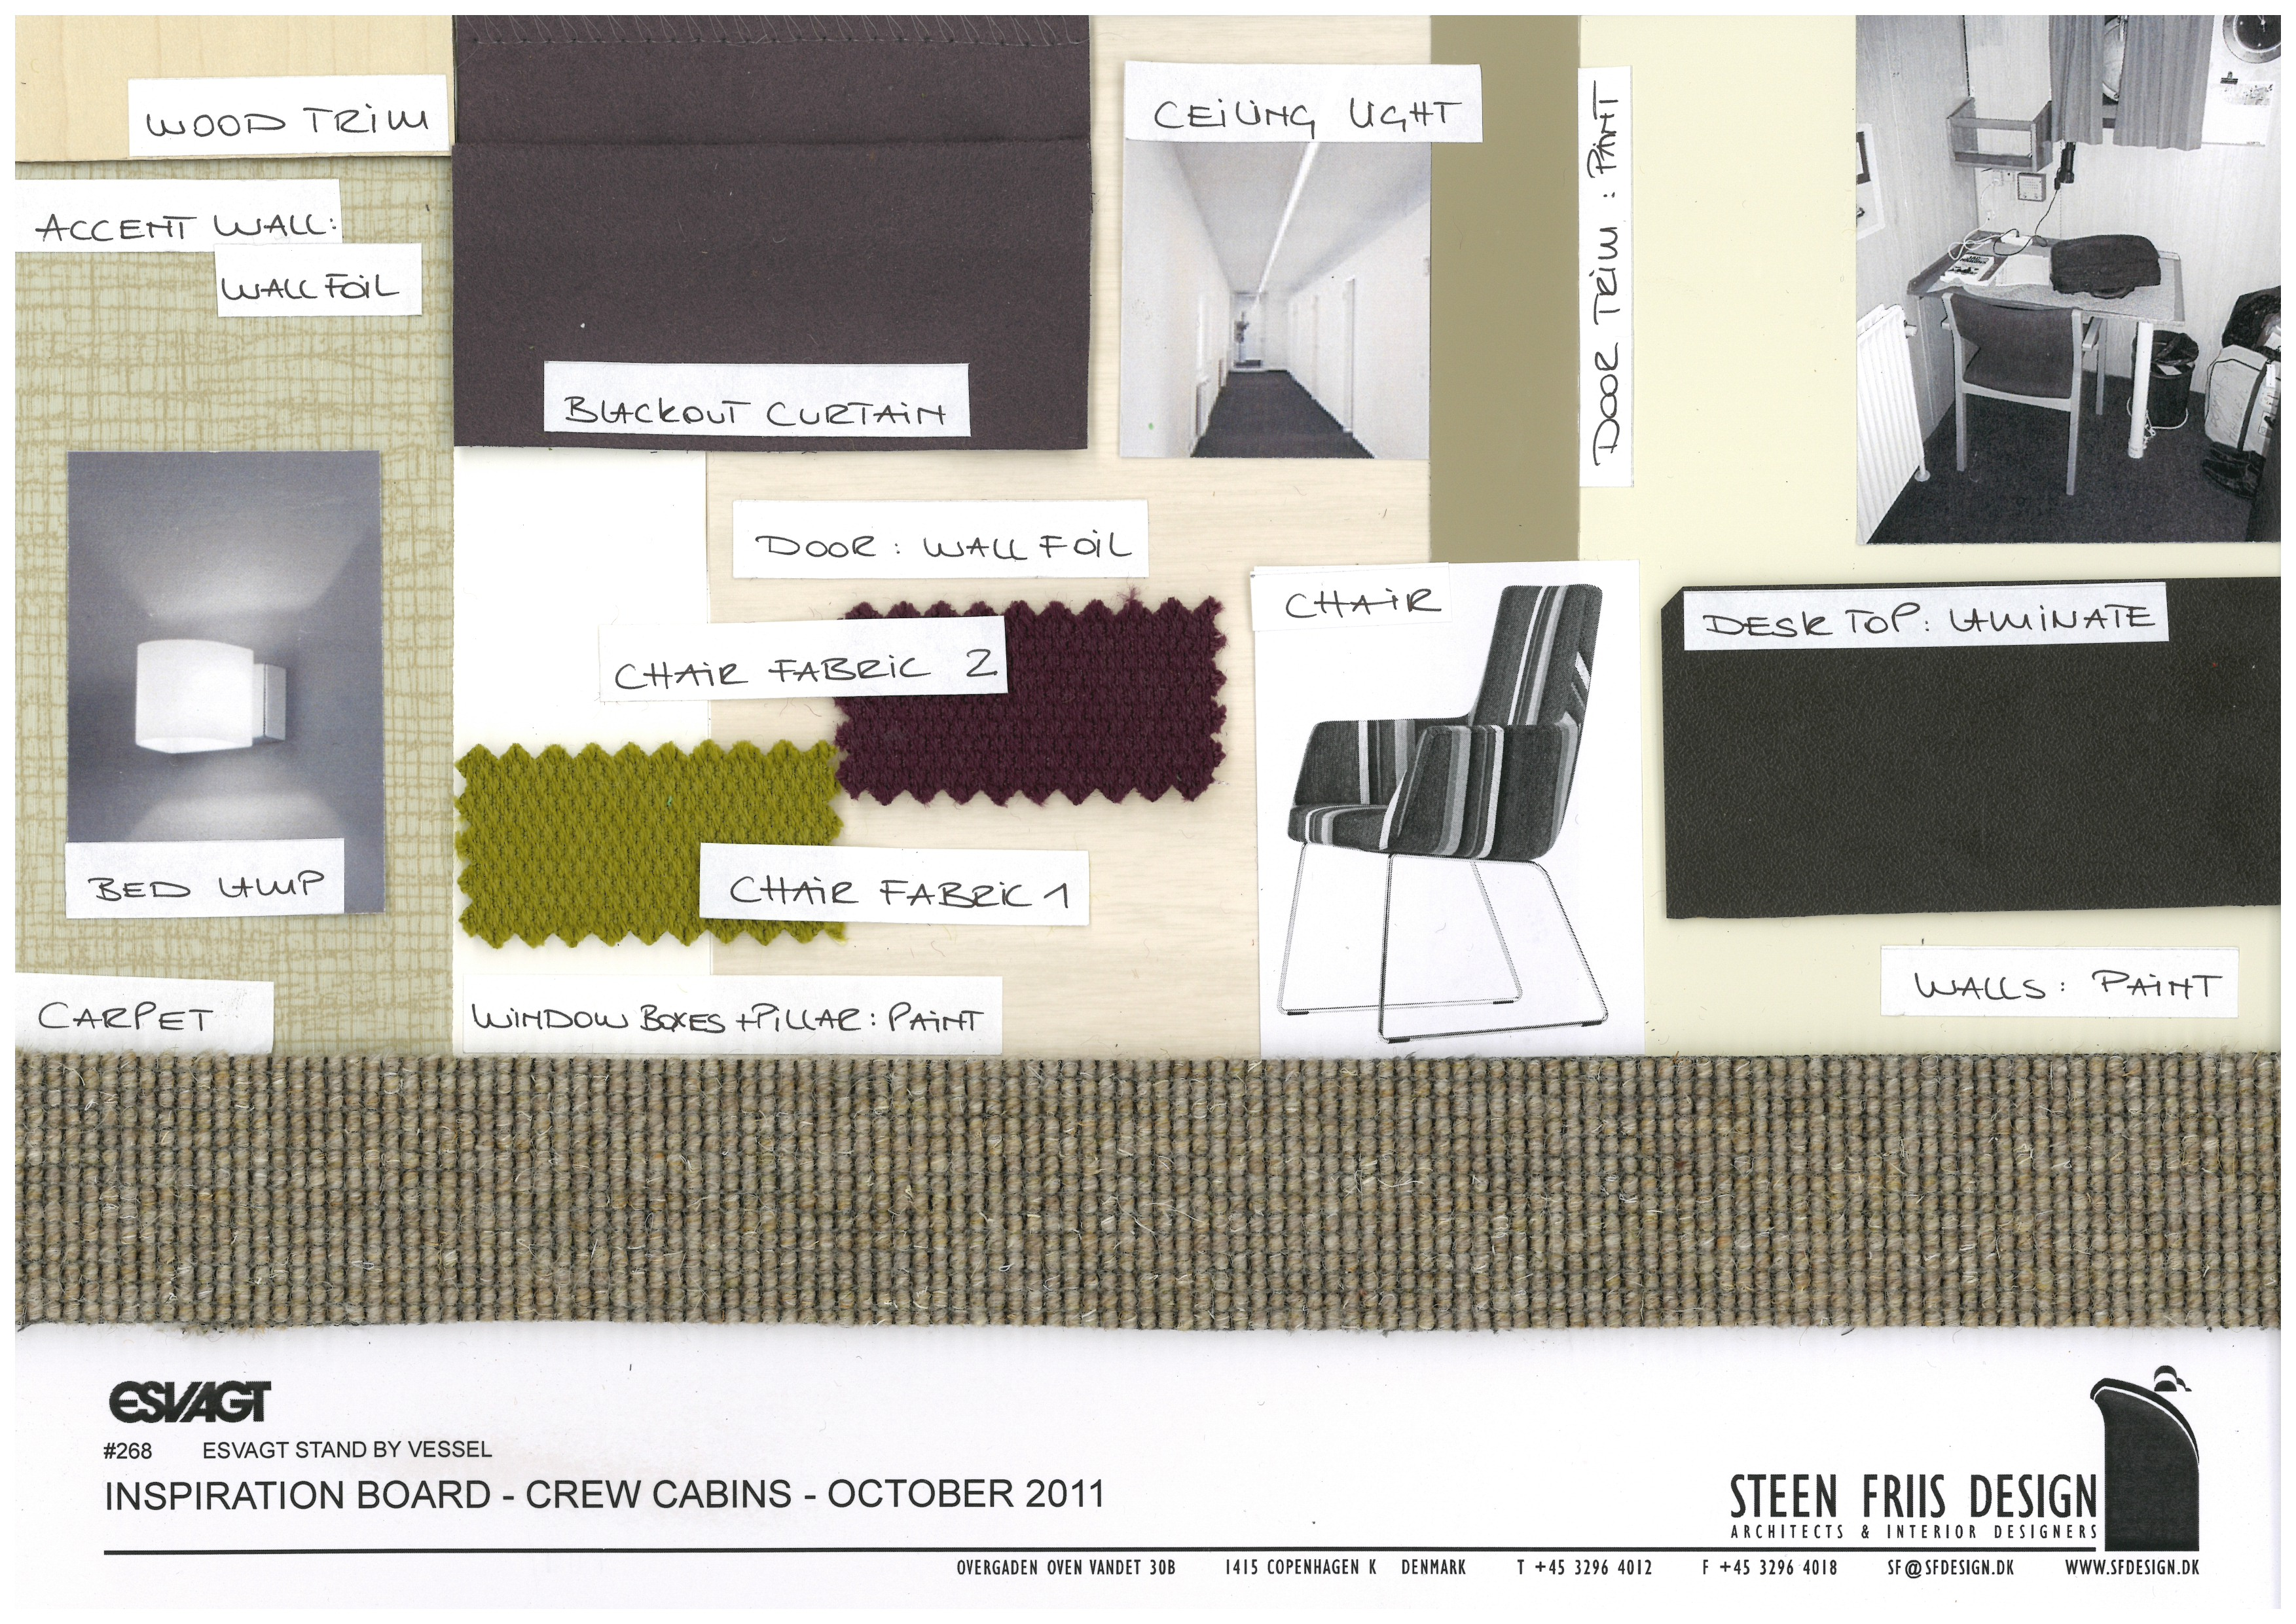 Interior design standby vessel by mae rickardsson at - Materials needed for interior design ...